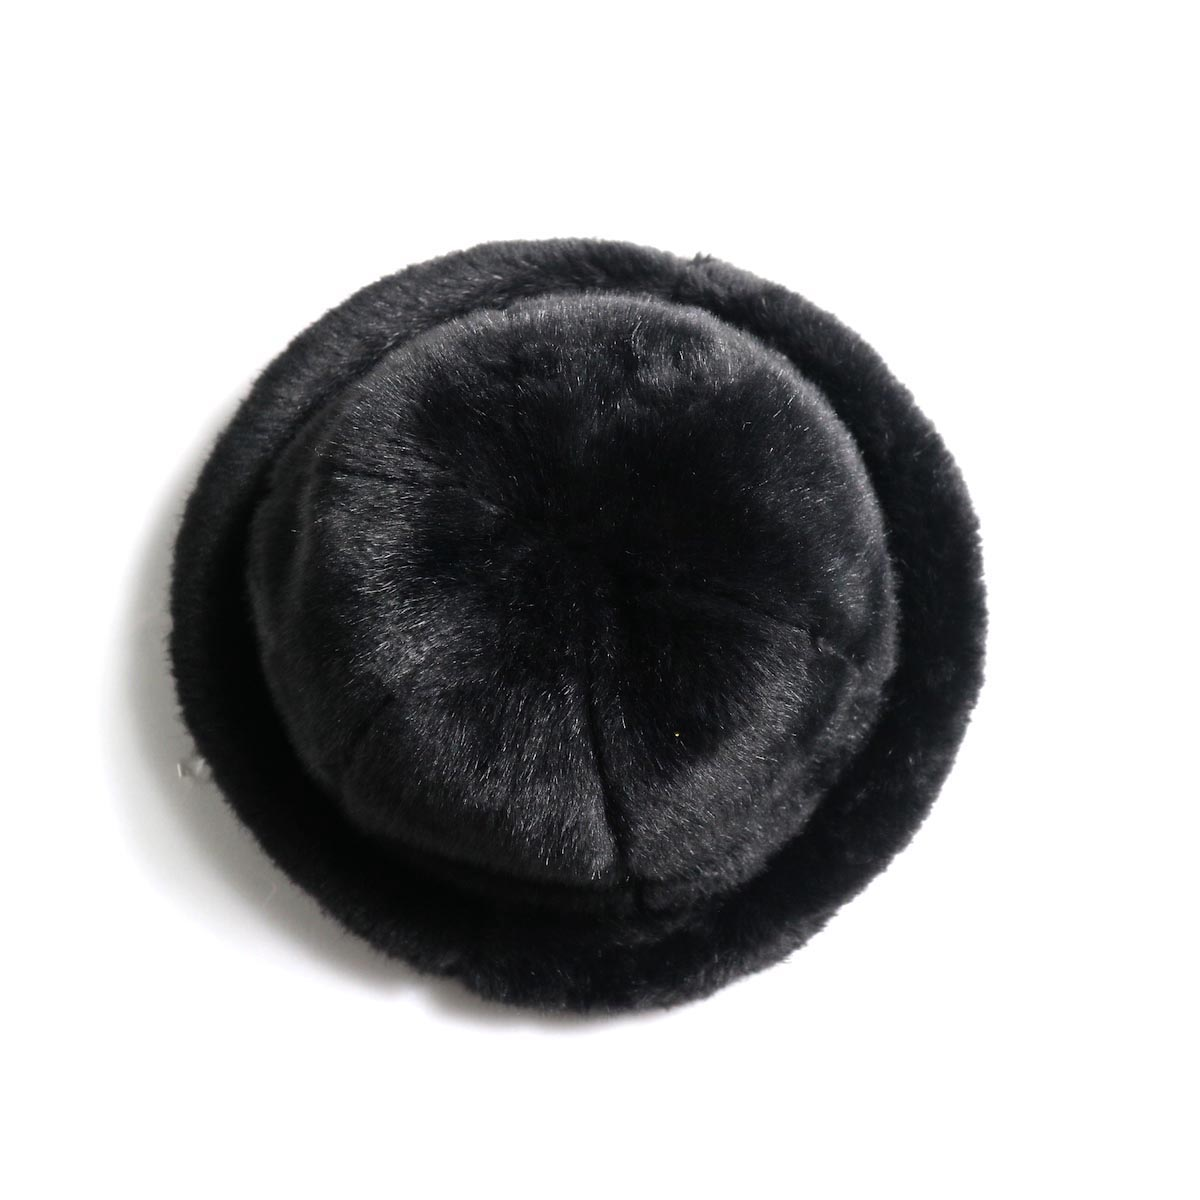 KIJIMA TAKAYUKI / Fake Fur 6 Panel Hat (No.182926) black 上